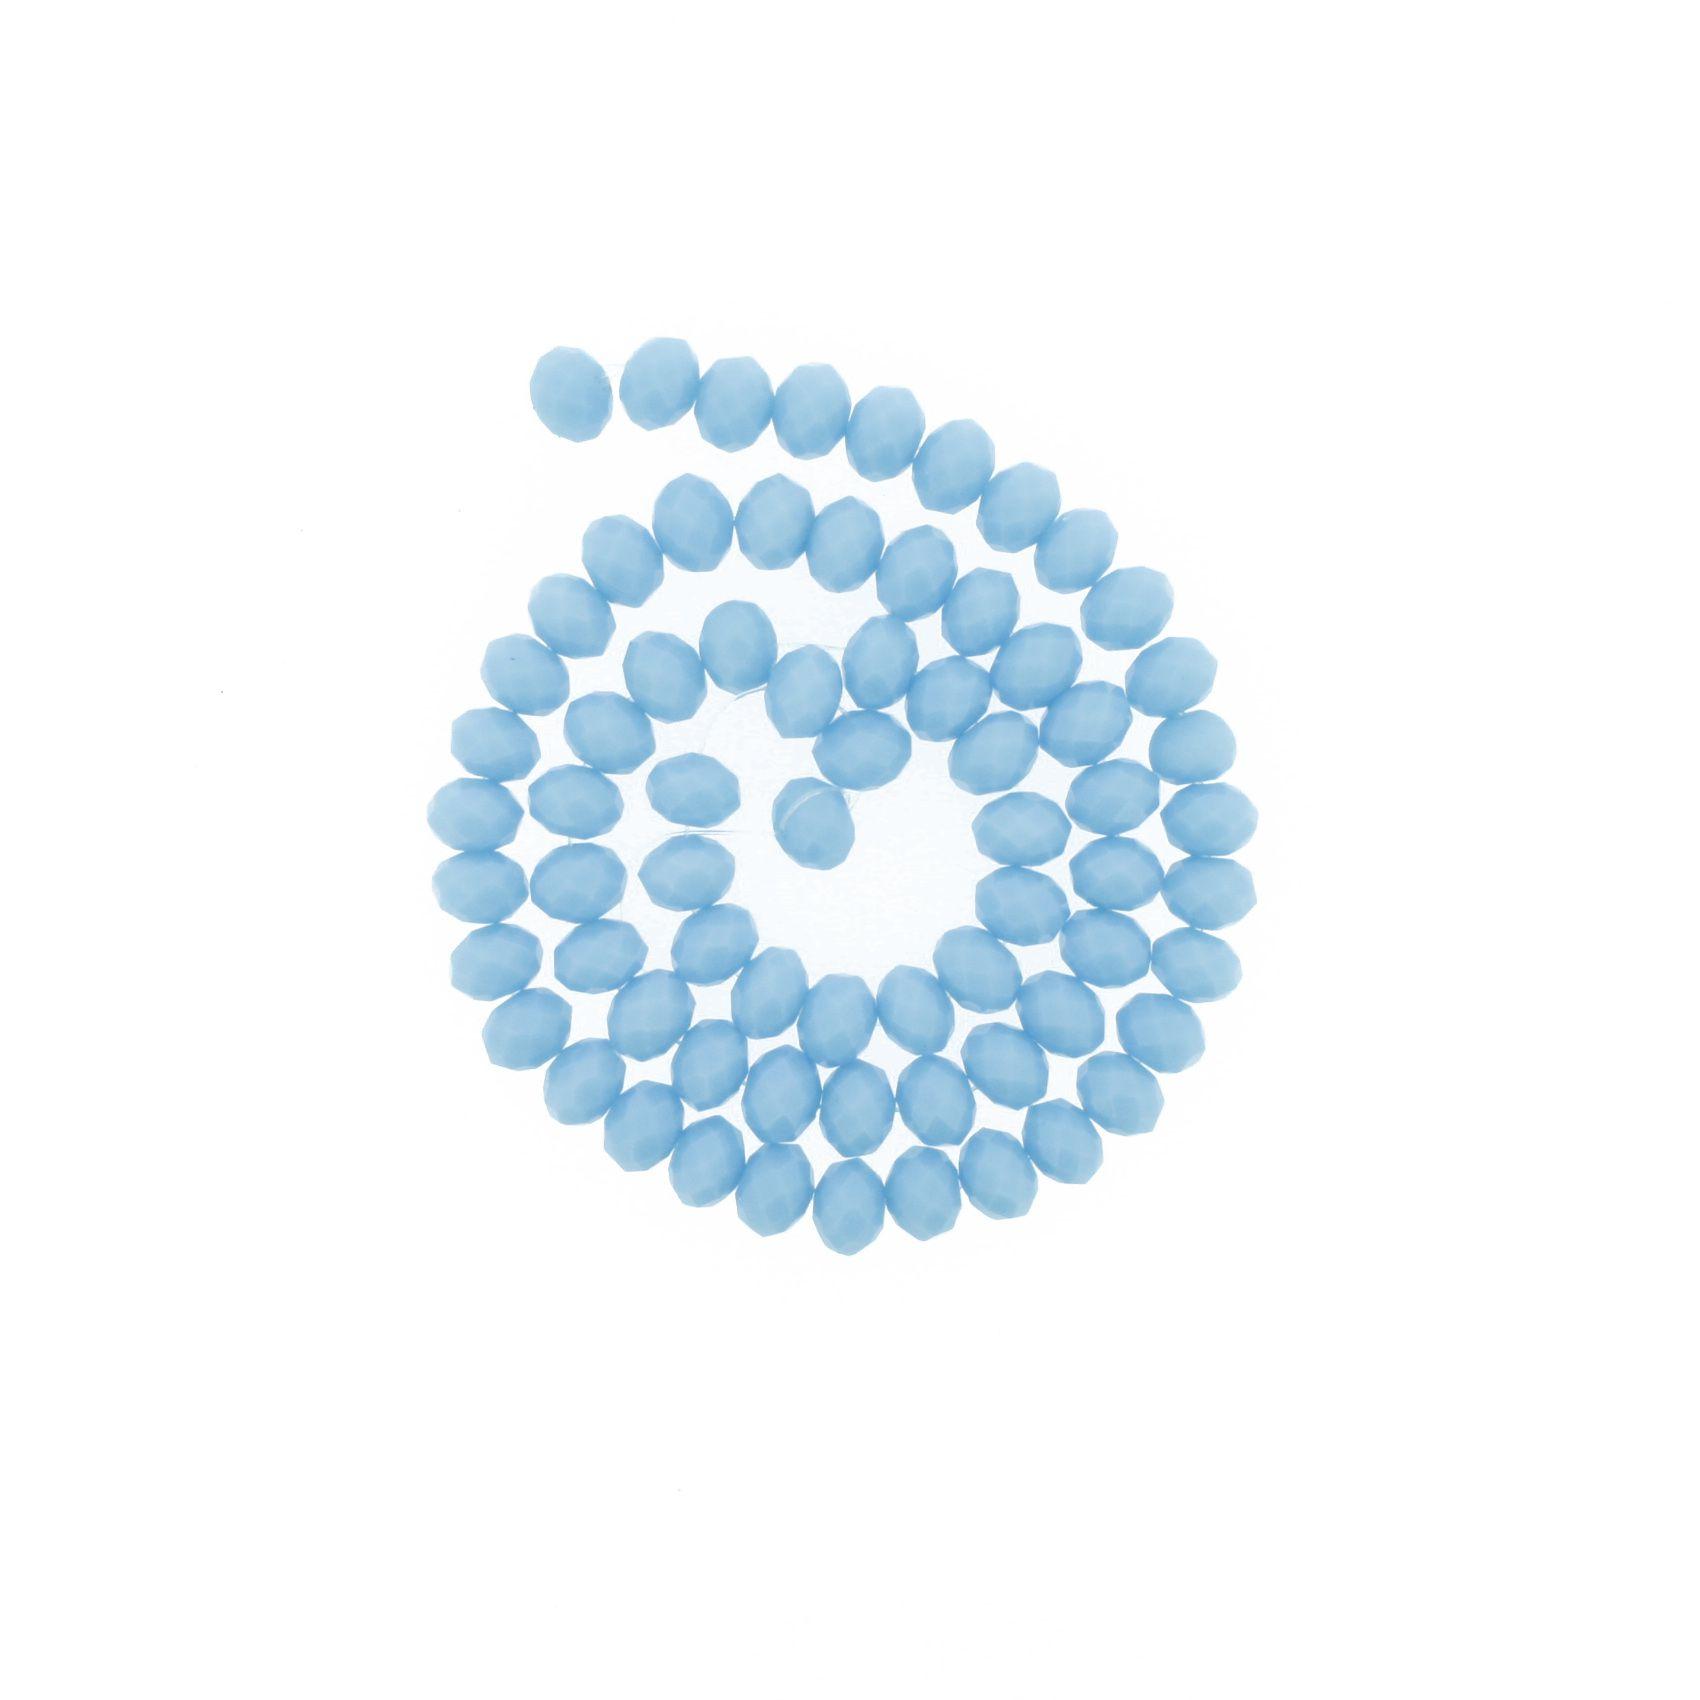 Fio de Cristal - Piatto® - Azul Claro - 8mm  - Universo Religioso® - Artigos de Umbanda e Candomblé